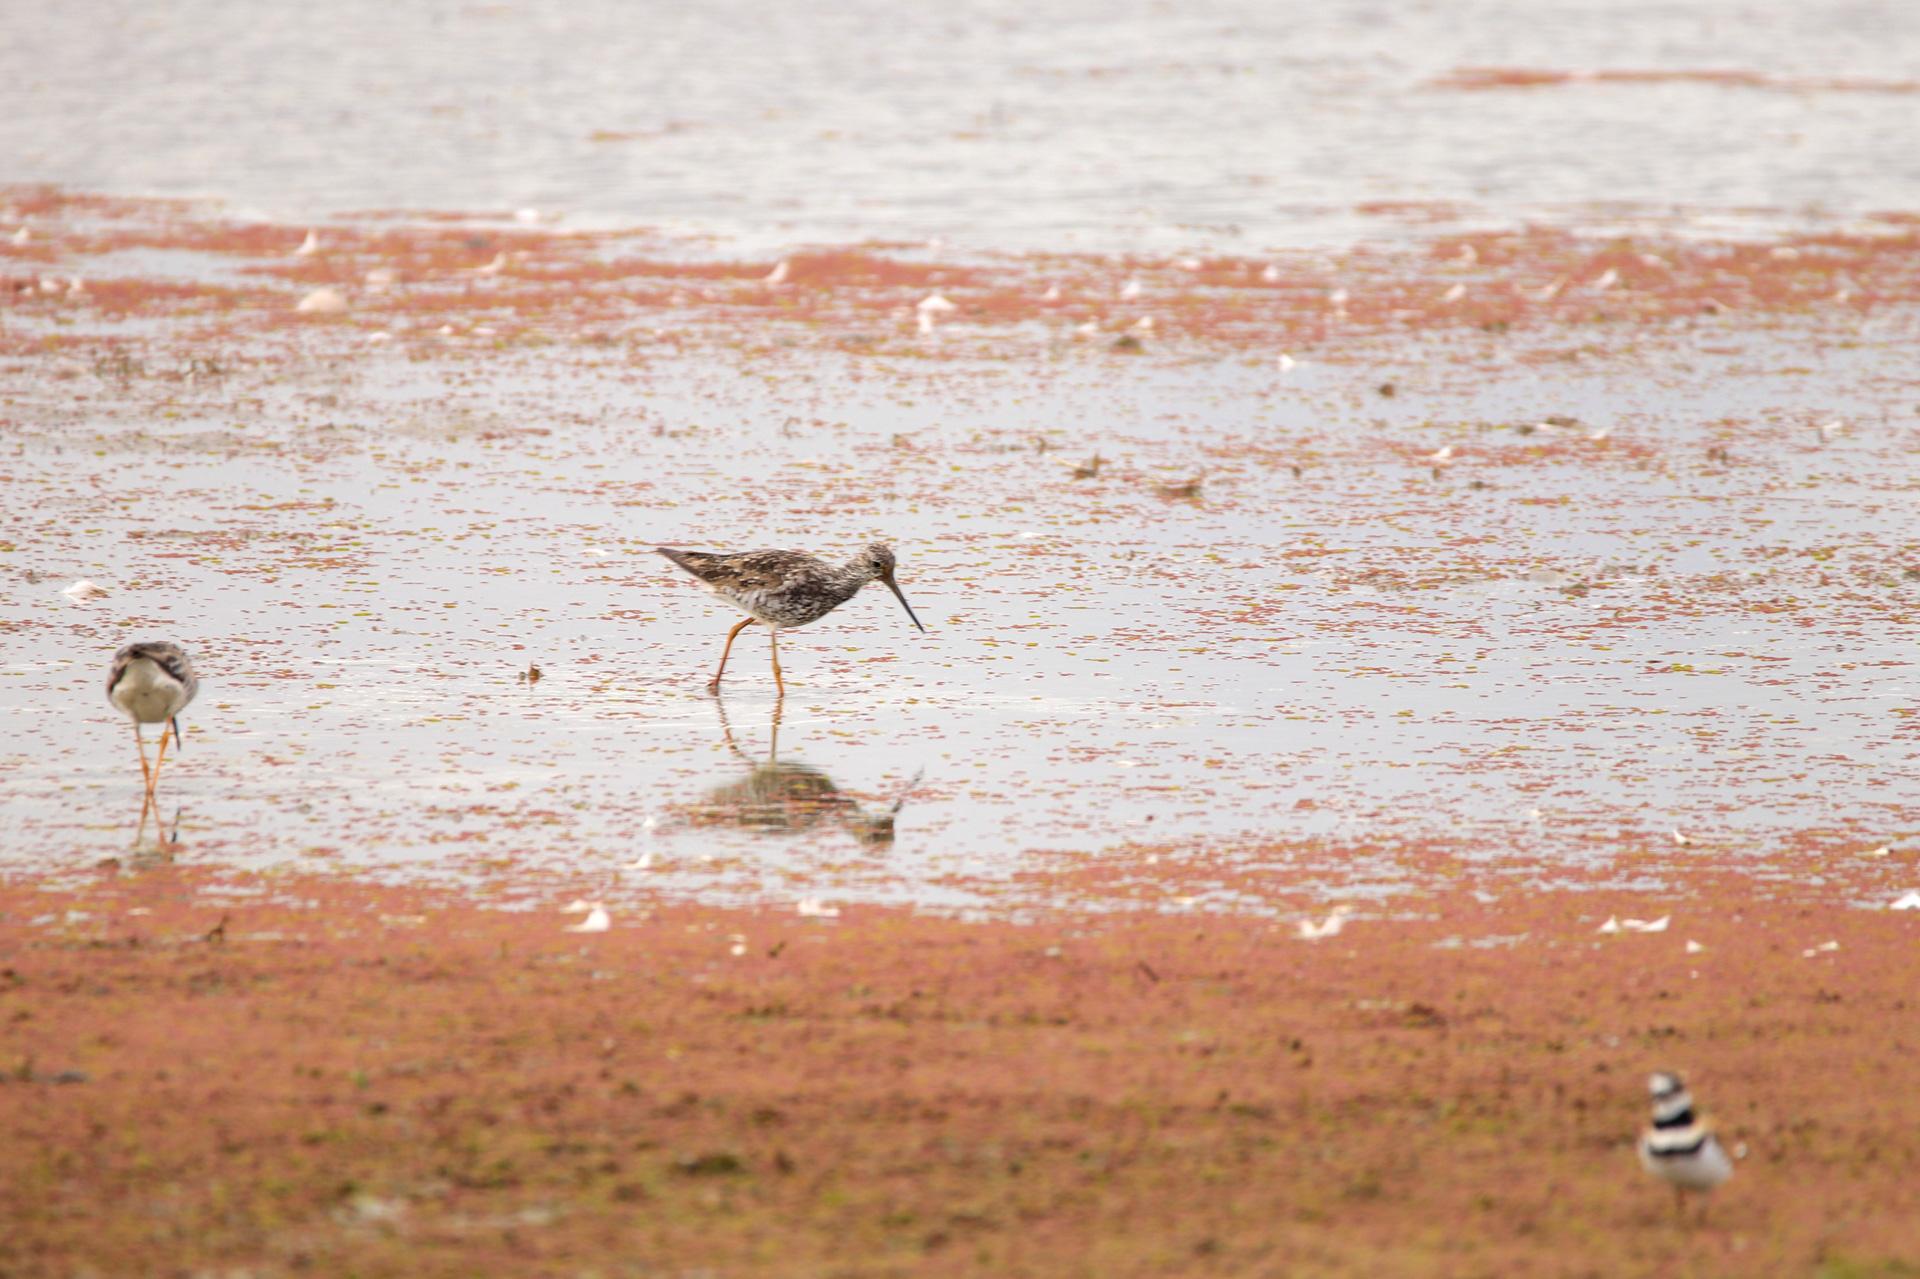 Shorebirds, like greater yellowlegs, are enjoying the mudflats of the drying 2S wetland.